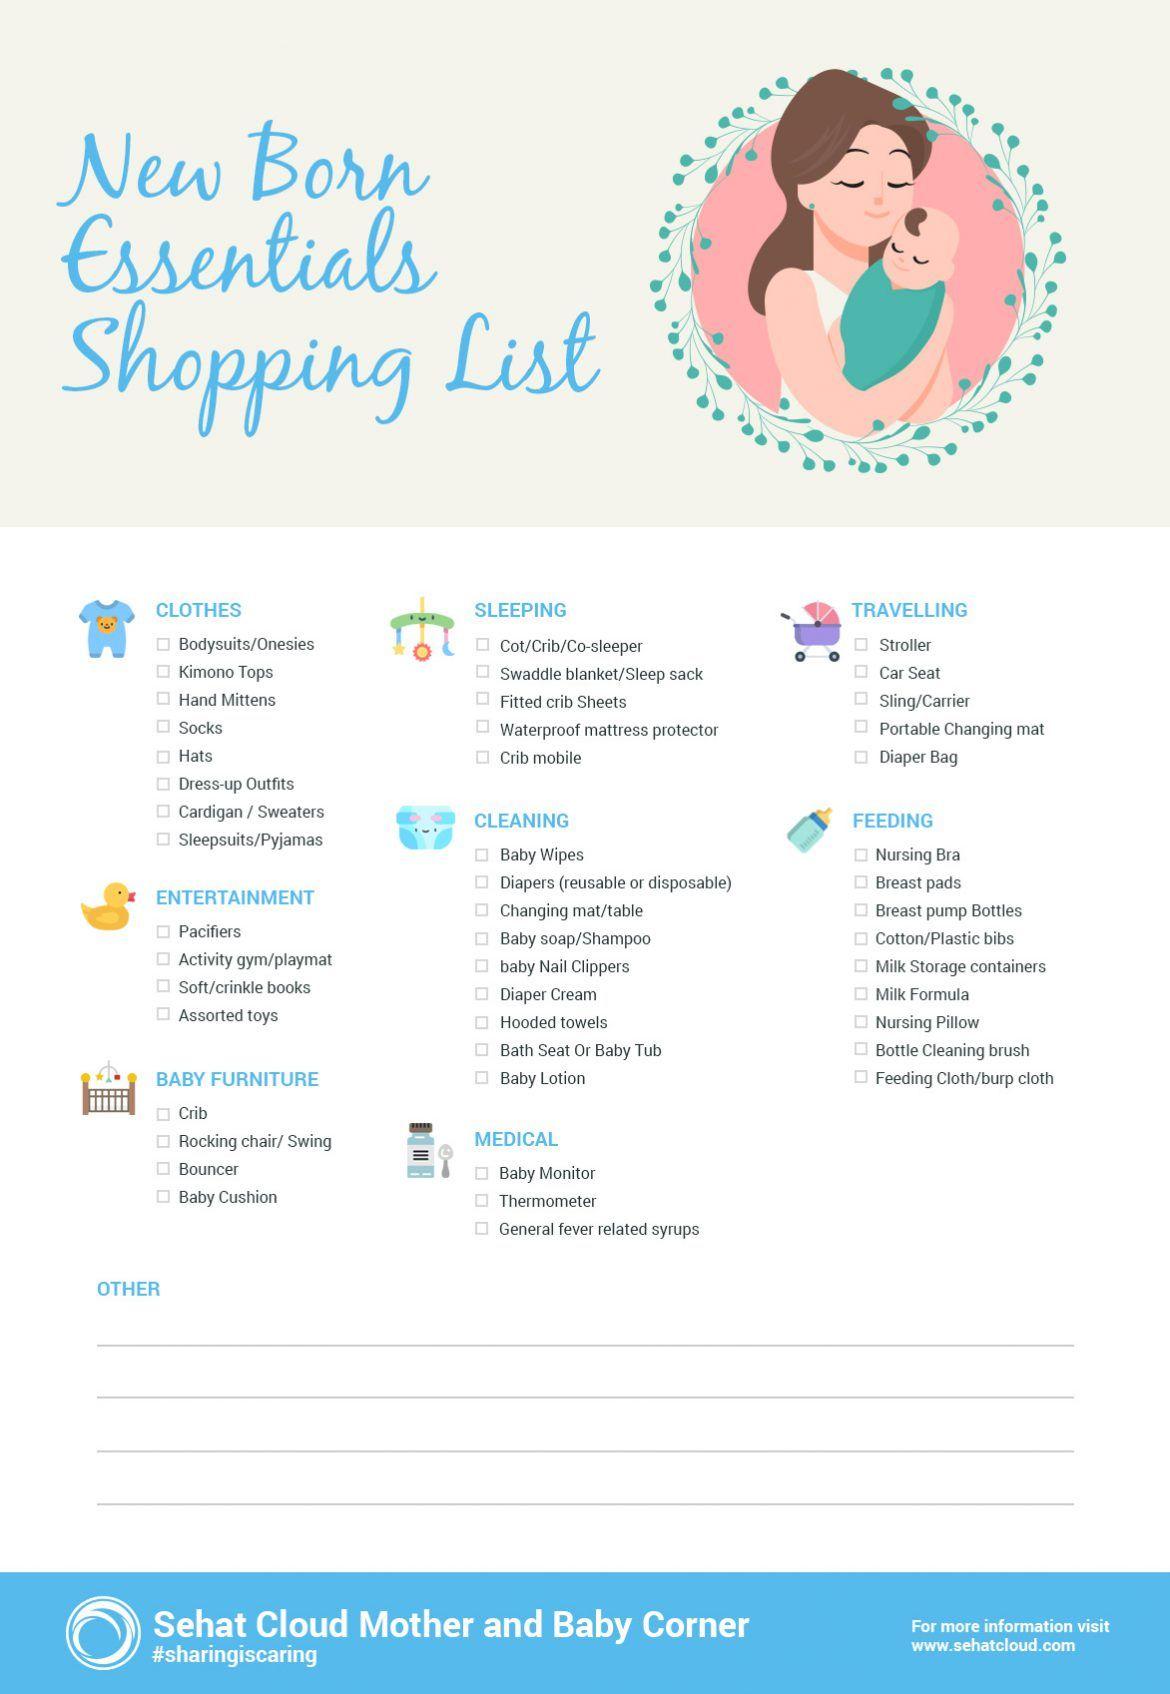 New Born Essentials Shopping List New Baby Checklist New Baby Products Baby Checklist Printable